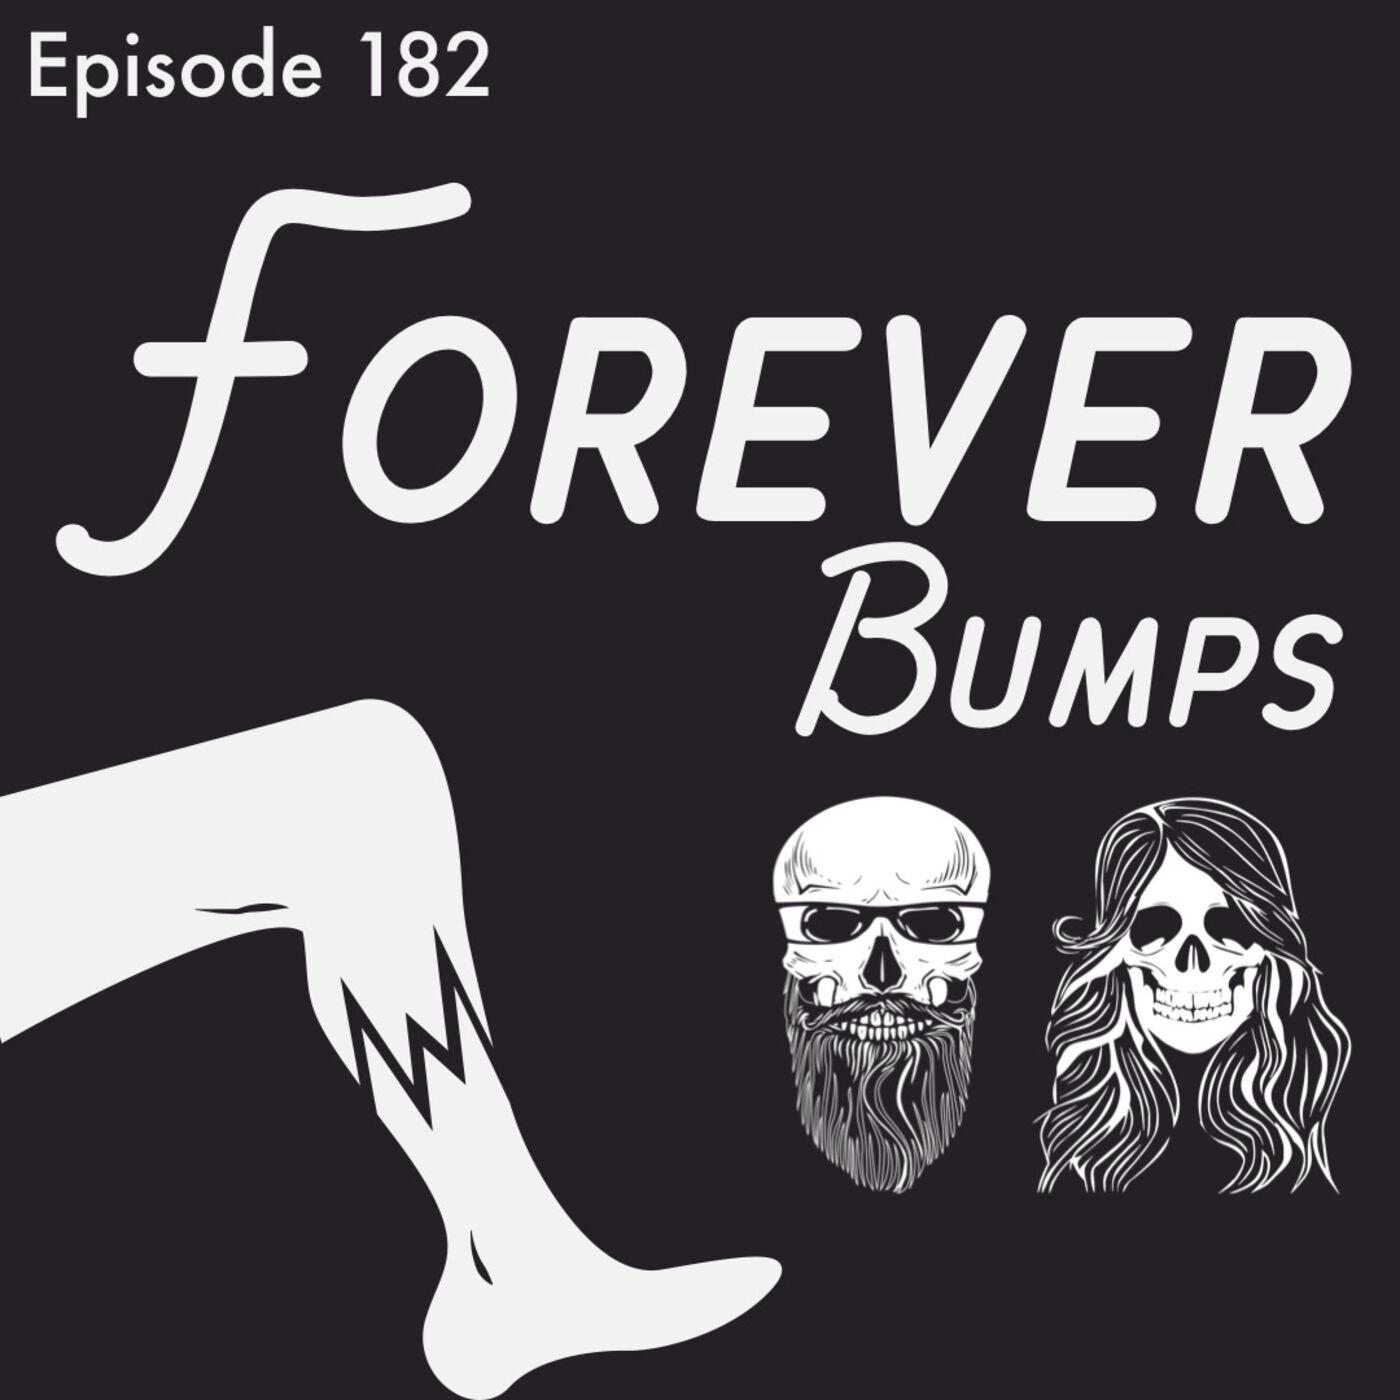 Episode 182: Forever Bumps